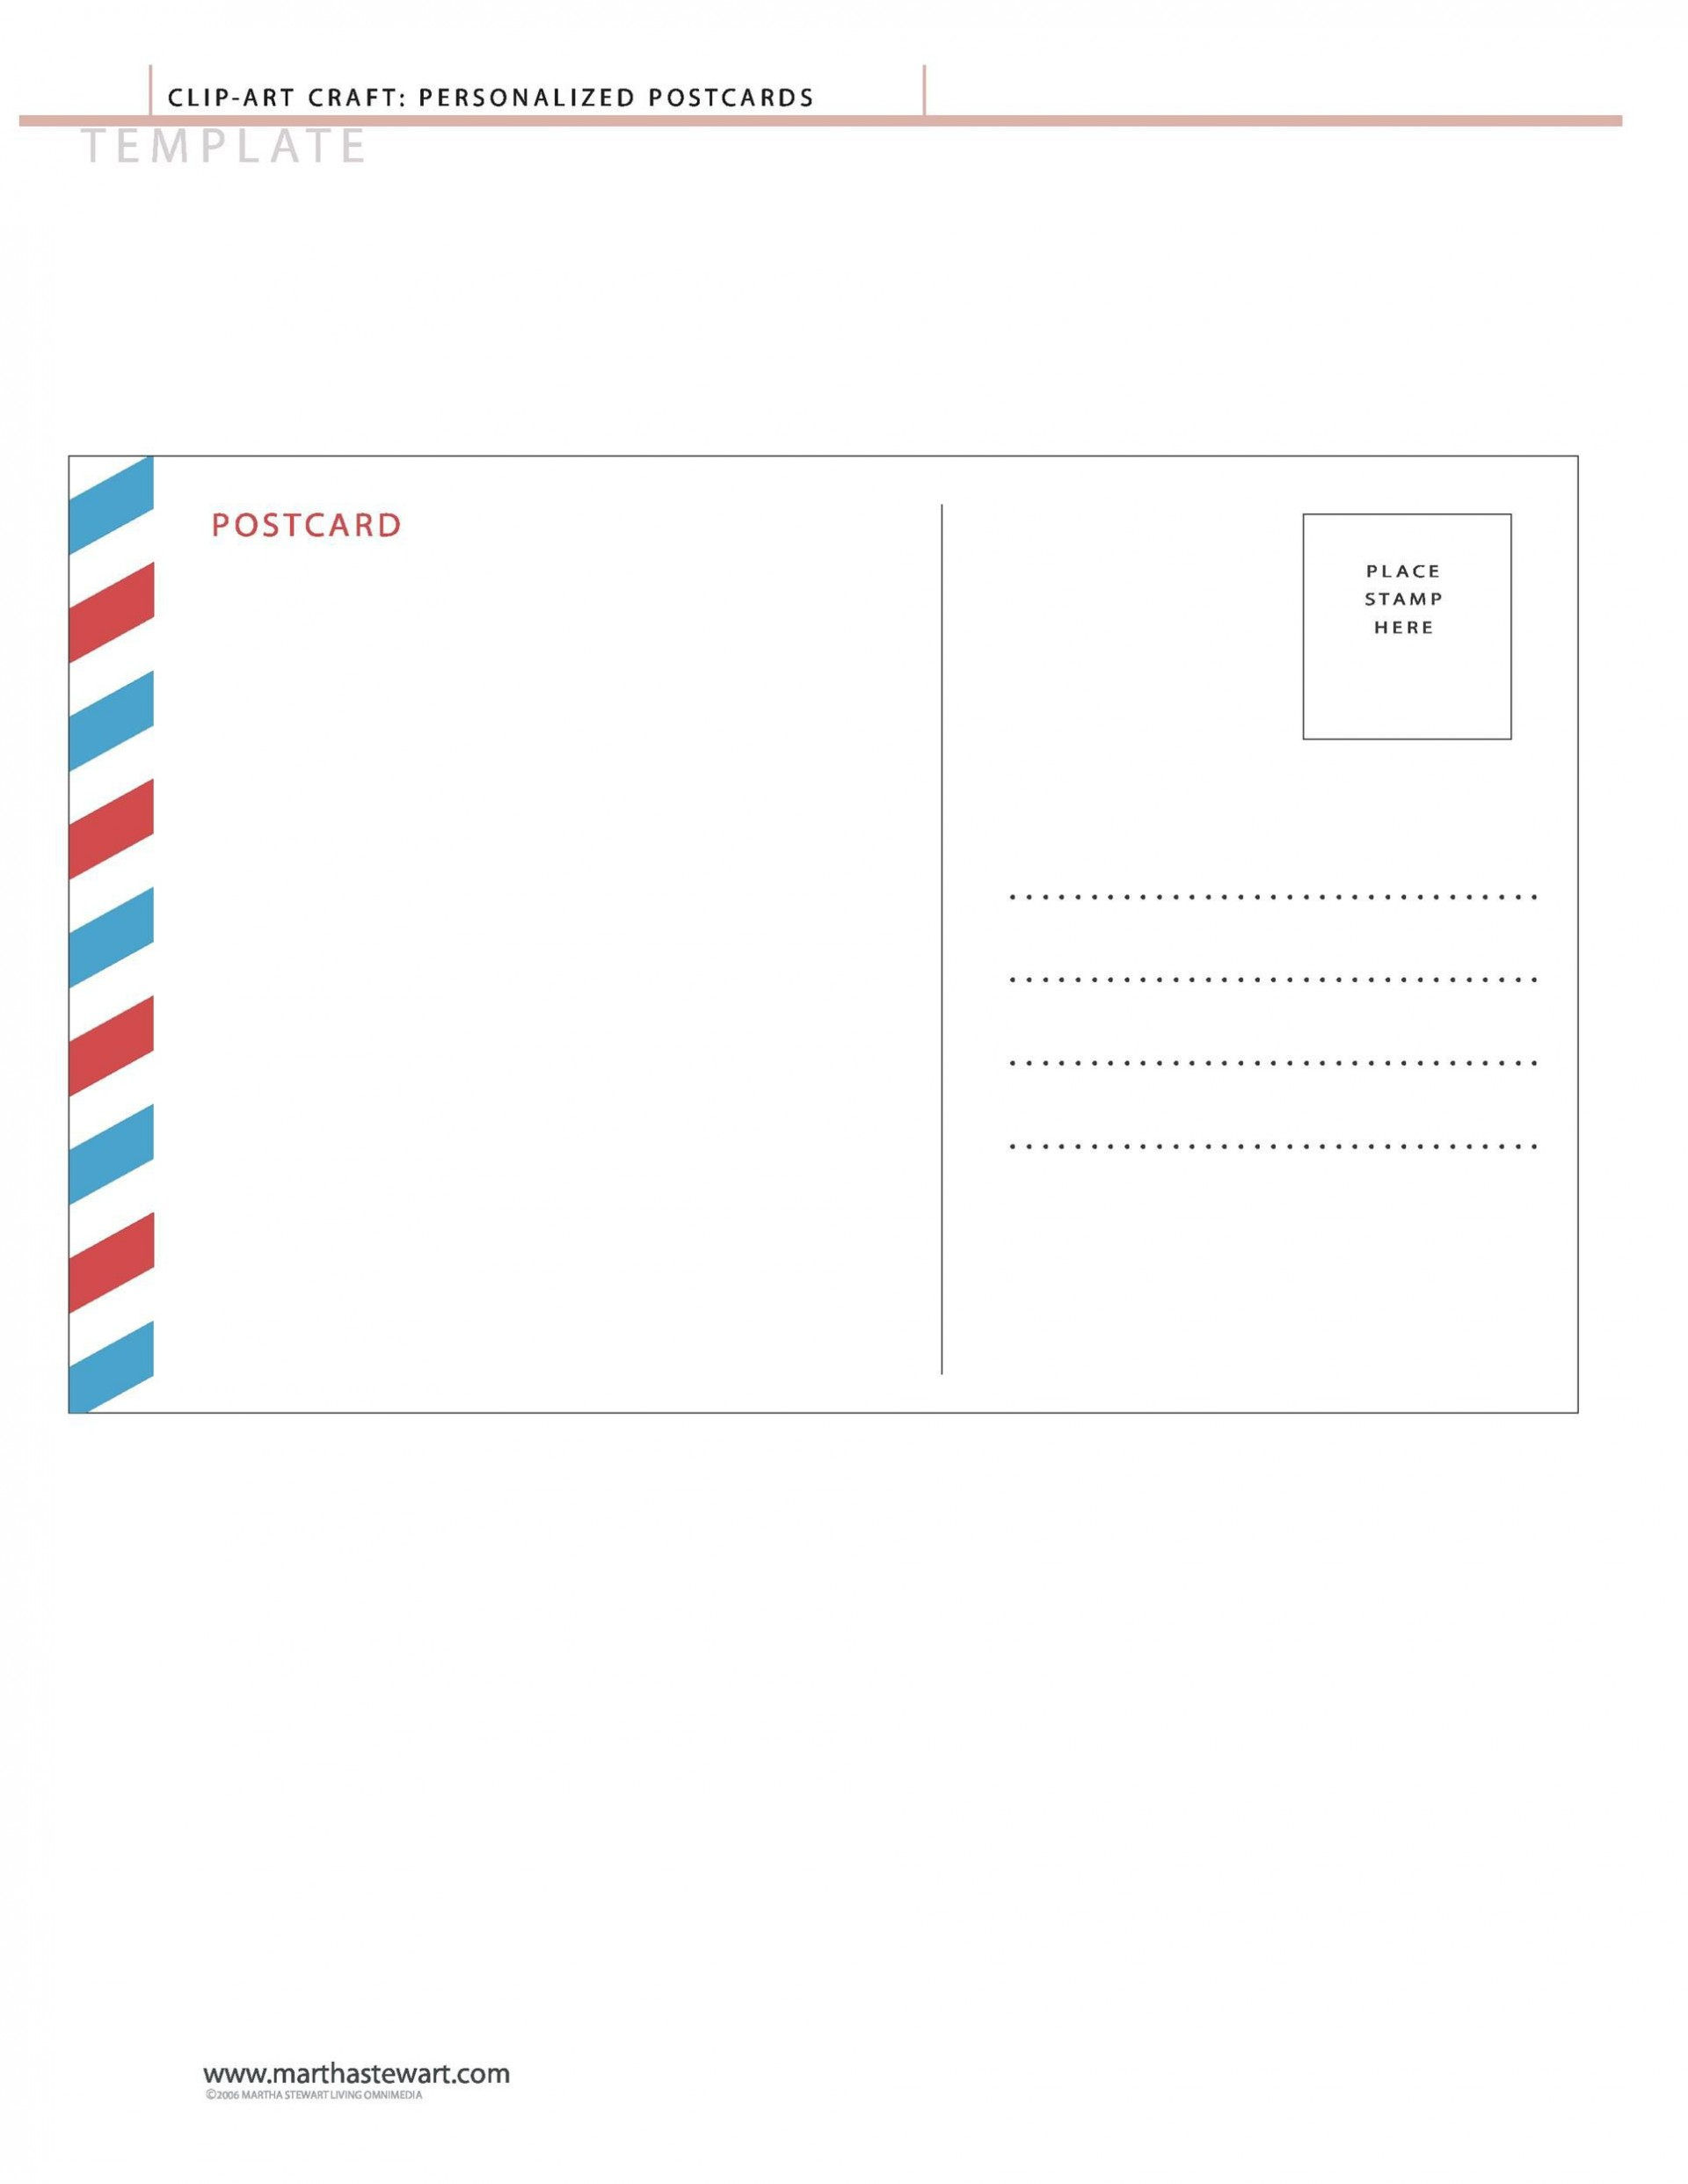 008 Stupendou Busines Postcard Template Microsoft Word Example 1920